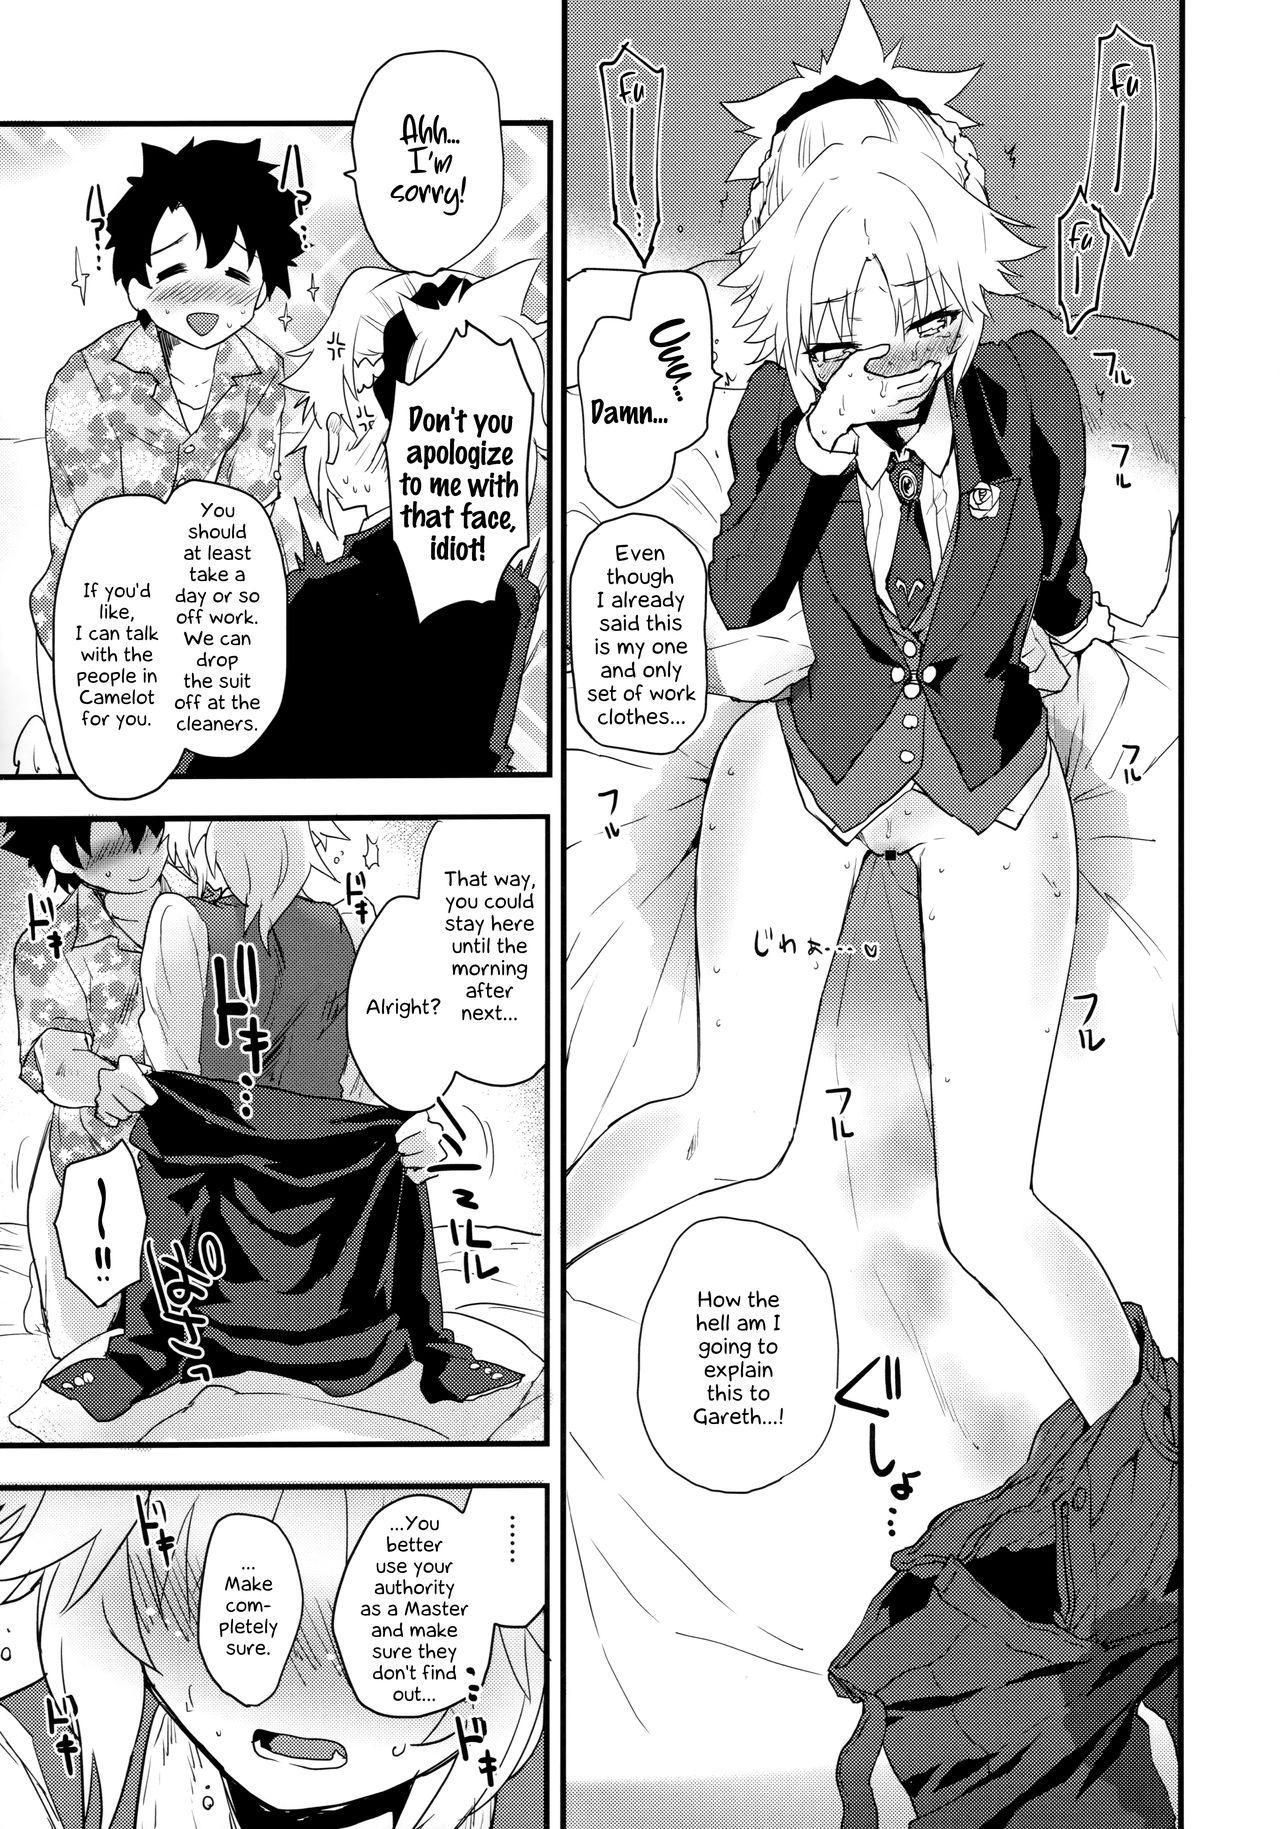 (COMIC1☆16) [Peθ (Mozu)] Full Dress Honey Knight -Kizuna10+ no Mor-san to Eirei Seisou- (Fate/Grand Order) [English] [EHCOVE] 9